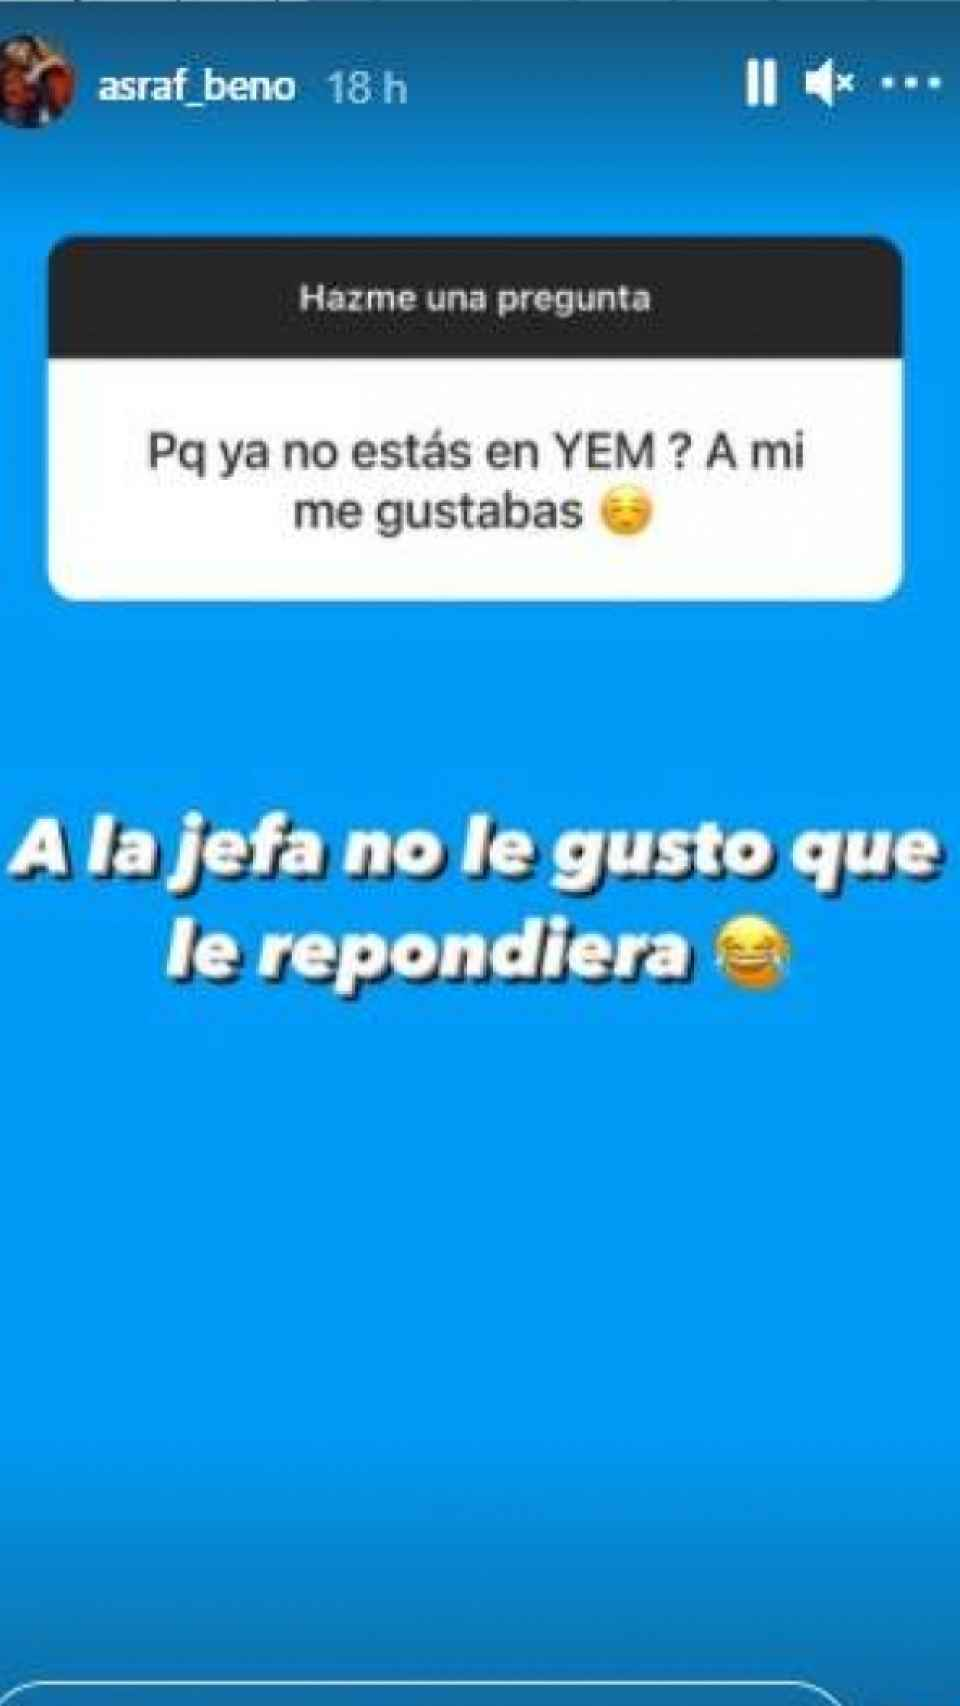 instagram-de-asraf